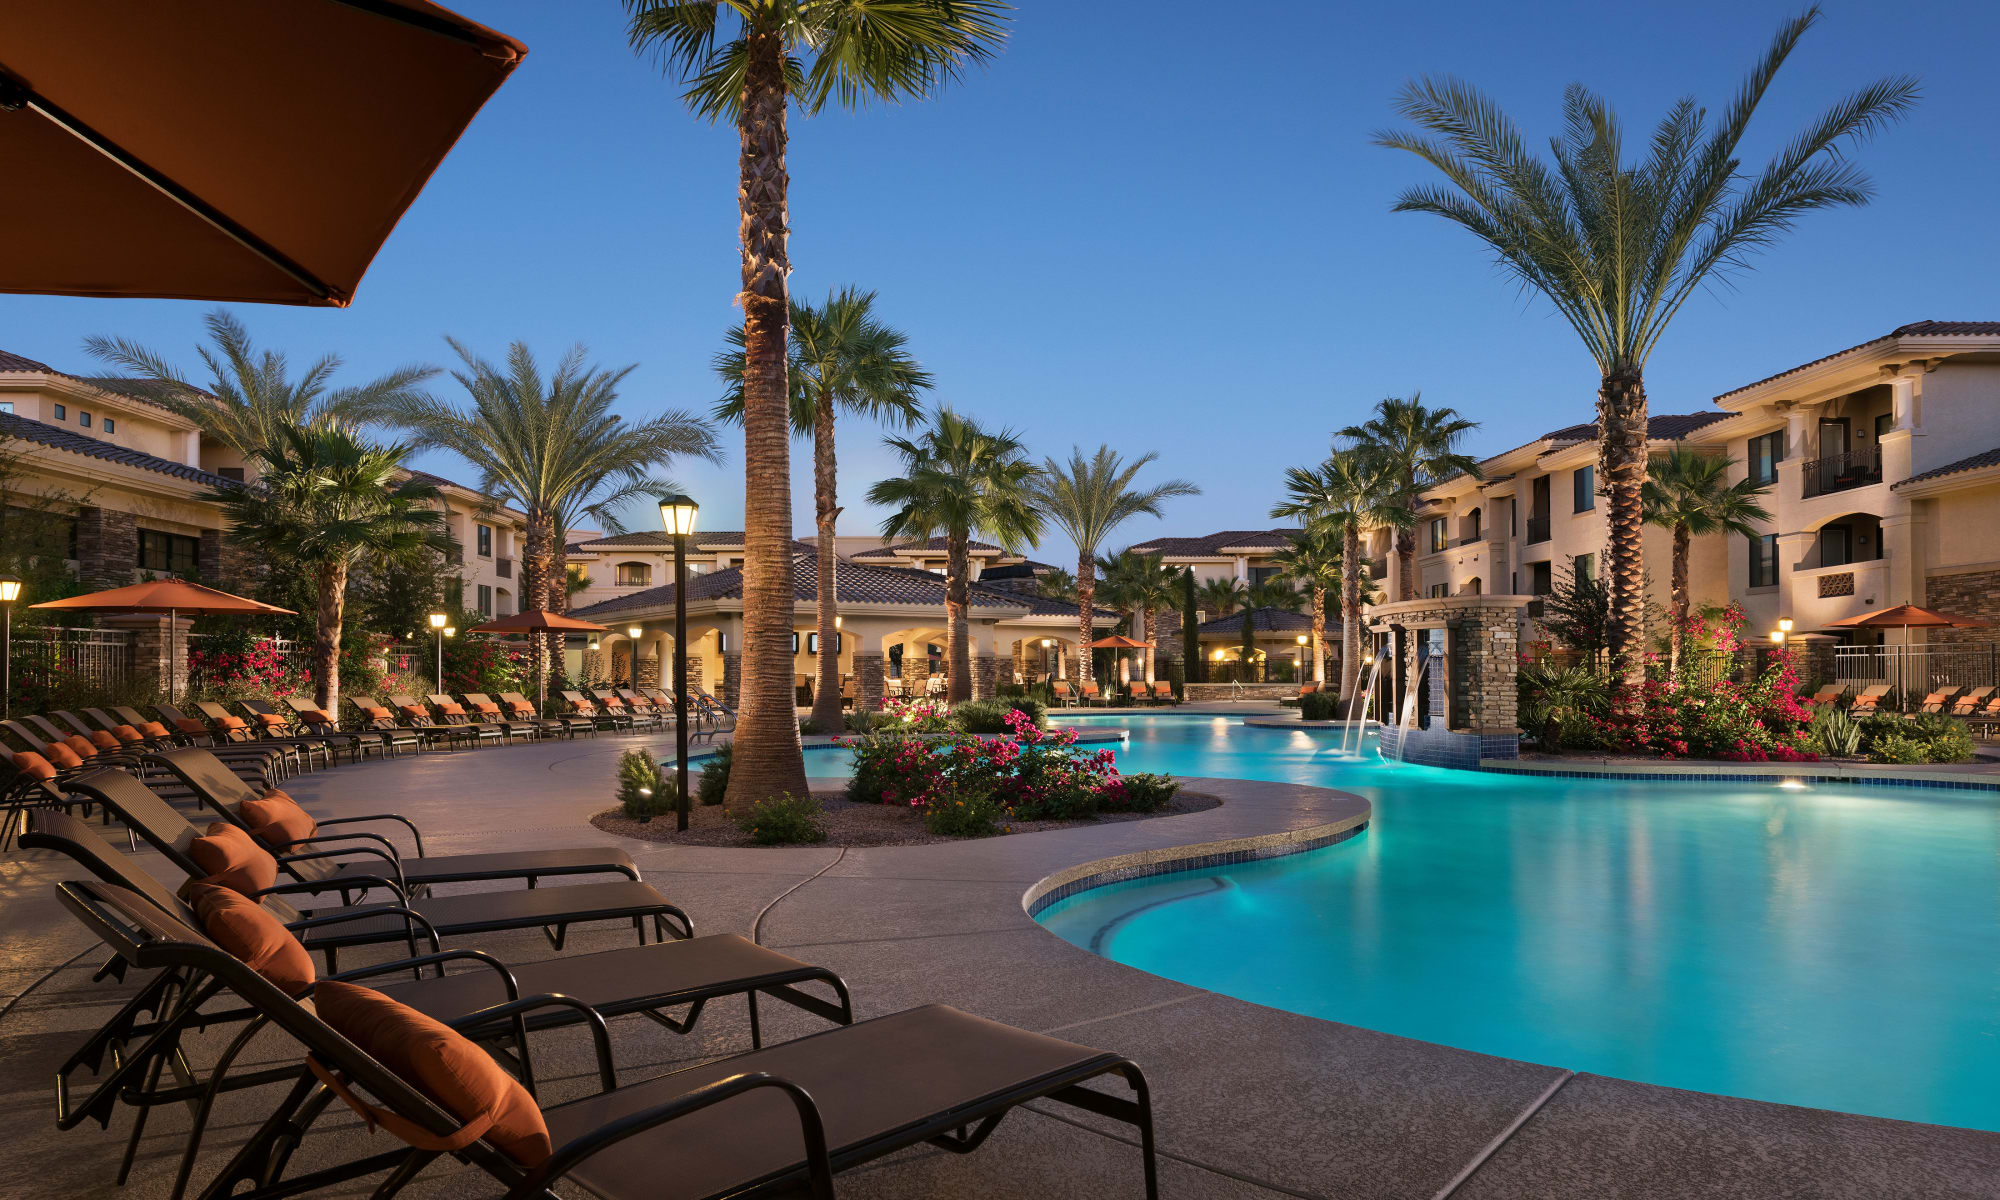 Apartments at San Travesia in Scottsdale, Arizona